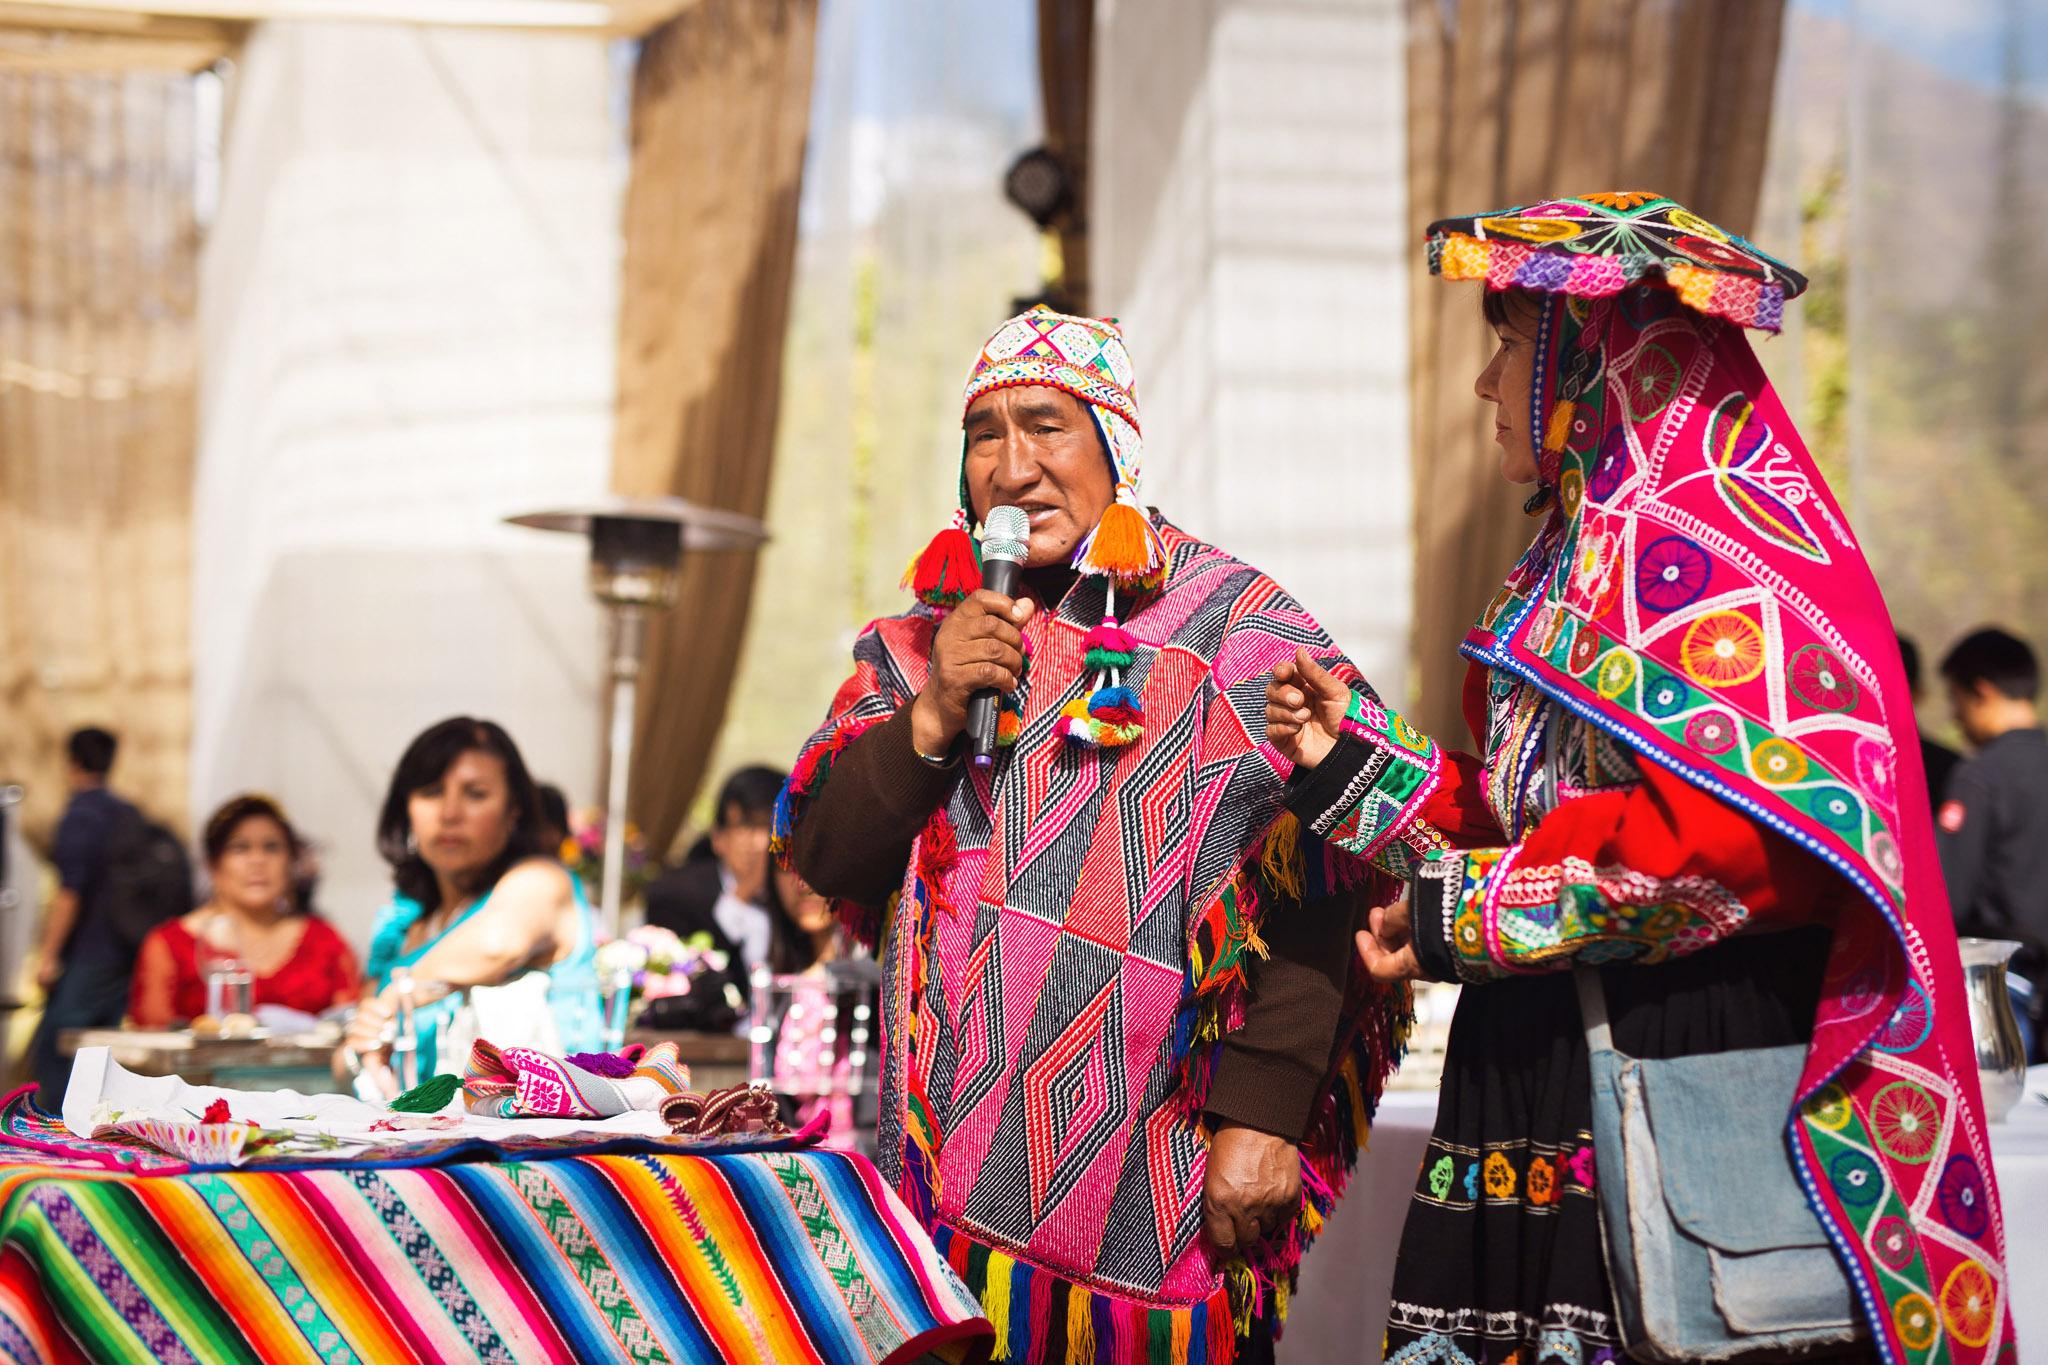 Wedding-Travellers-Destination-Wedding-Peru-Cusco-Hacienda-Sarapampa-Sacred-Valley-traditional-andean-ceremony